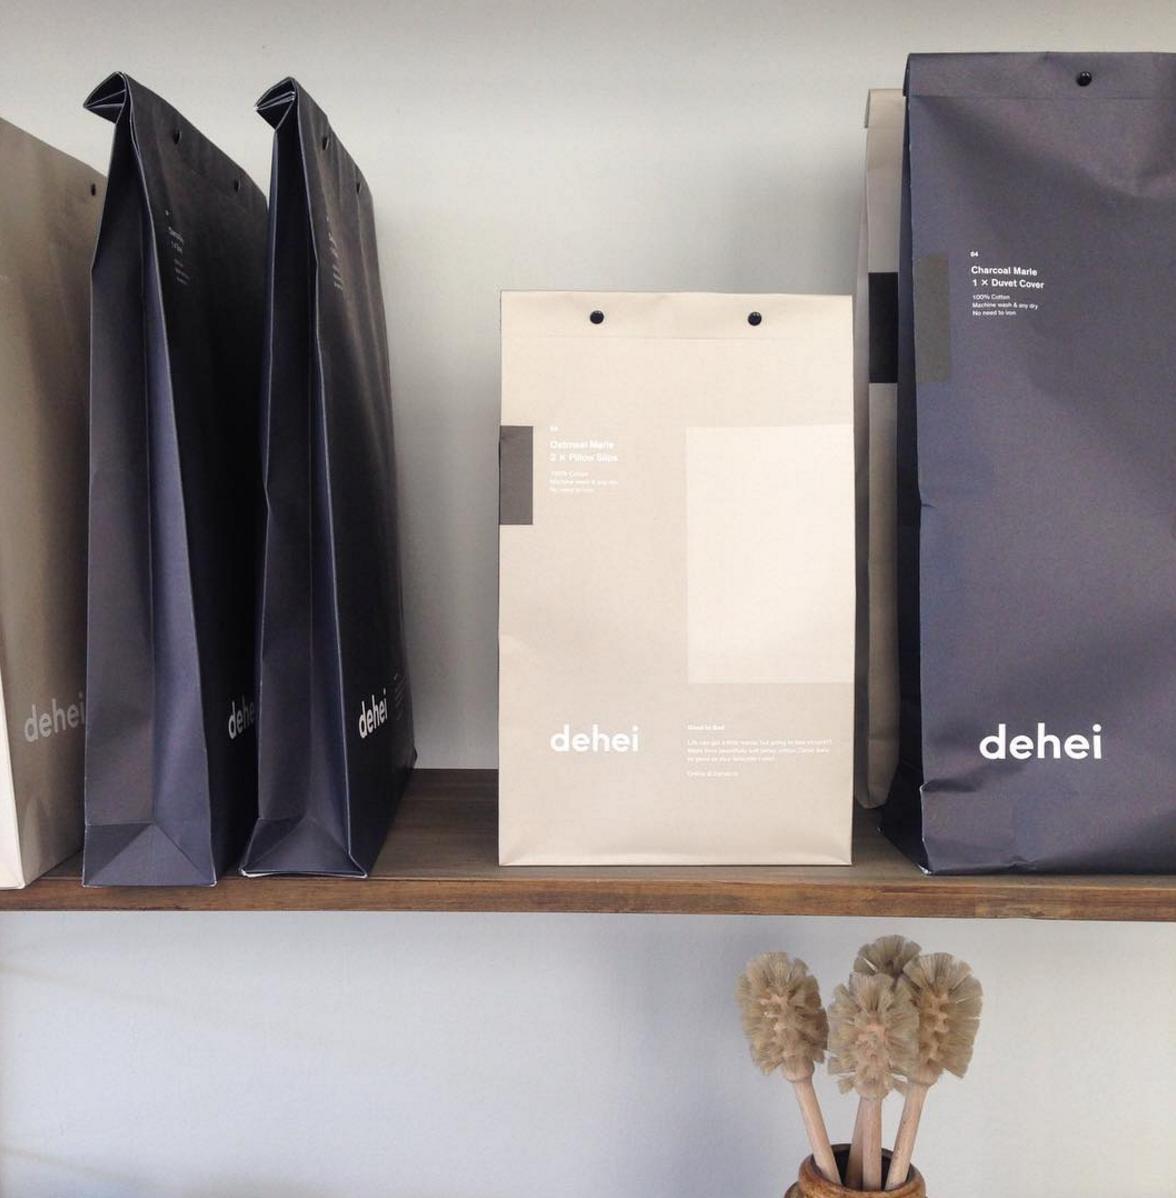 dehei-bedding-packaging-remodelista